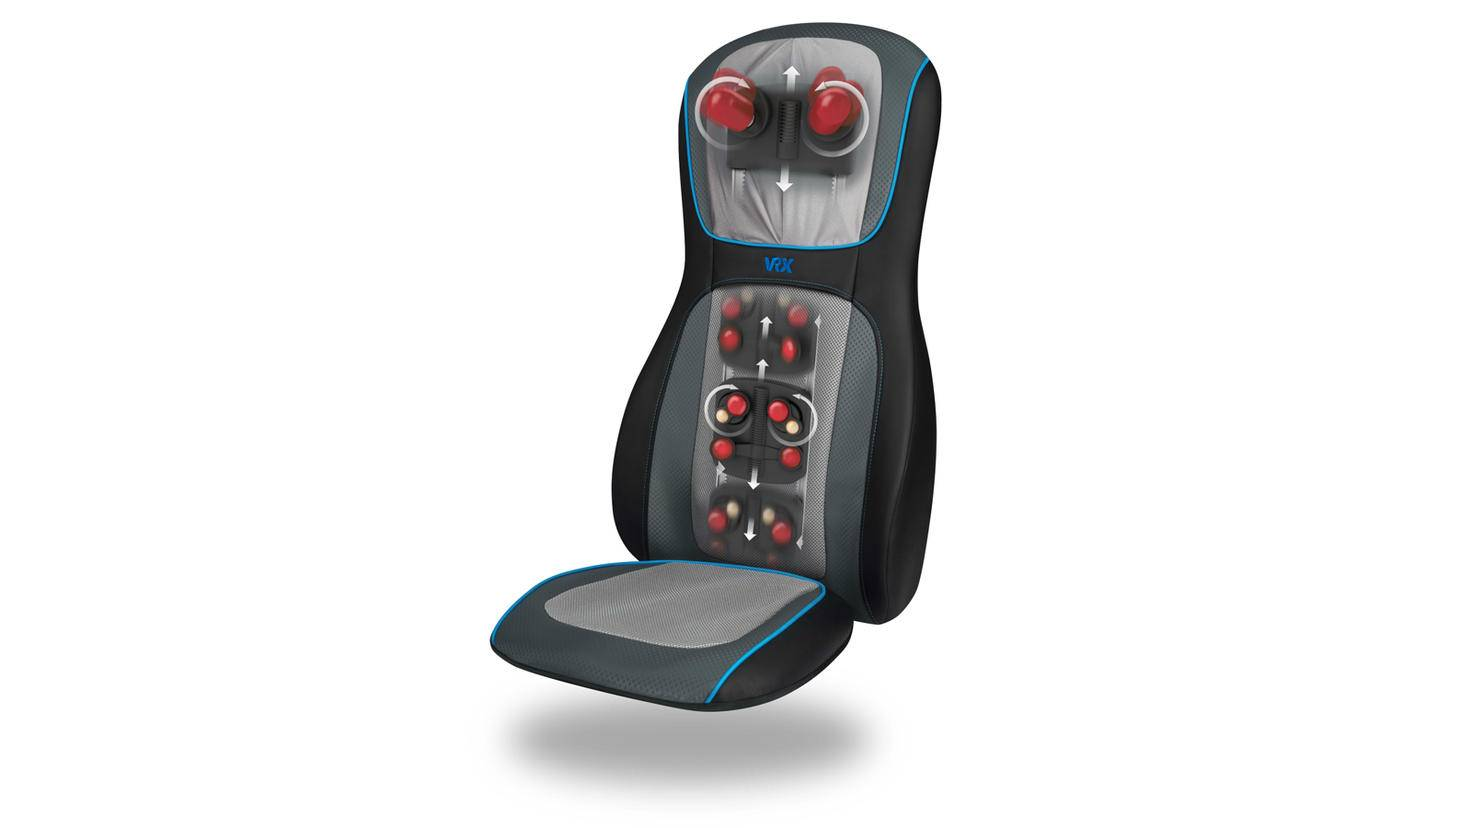 Housse de siège de massage HoMedics Virtual Reality MCS-1000HVR-EU